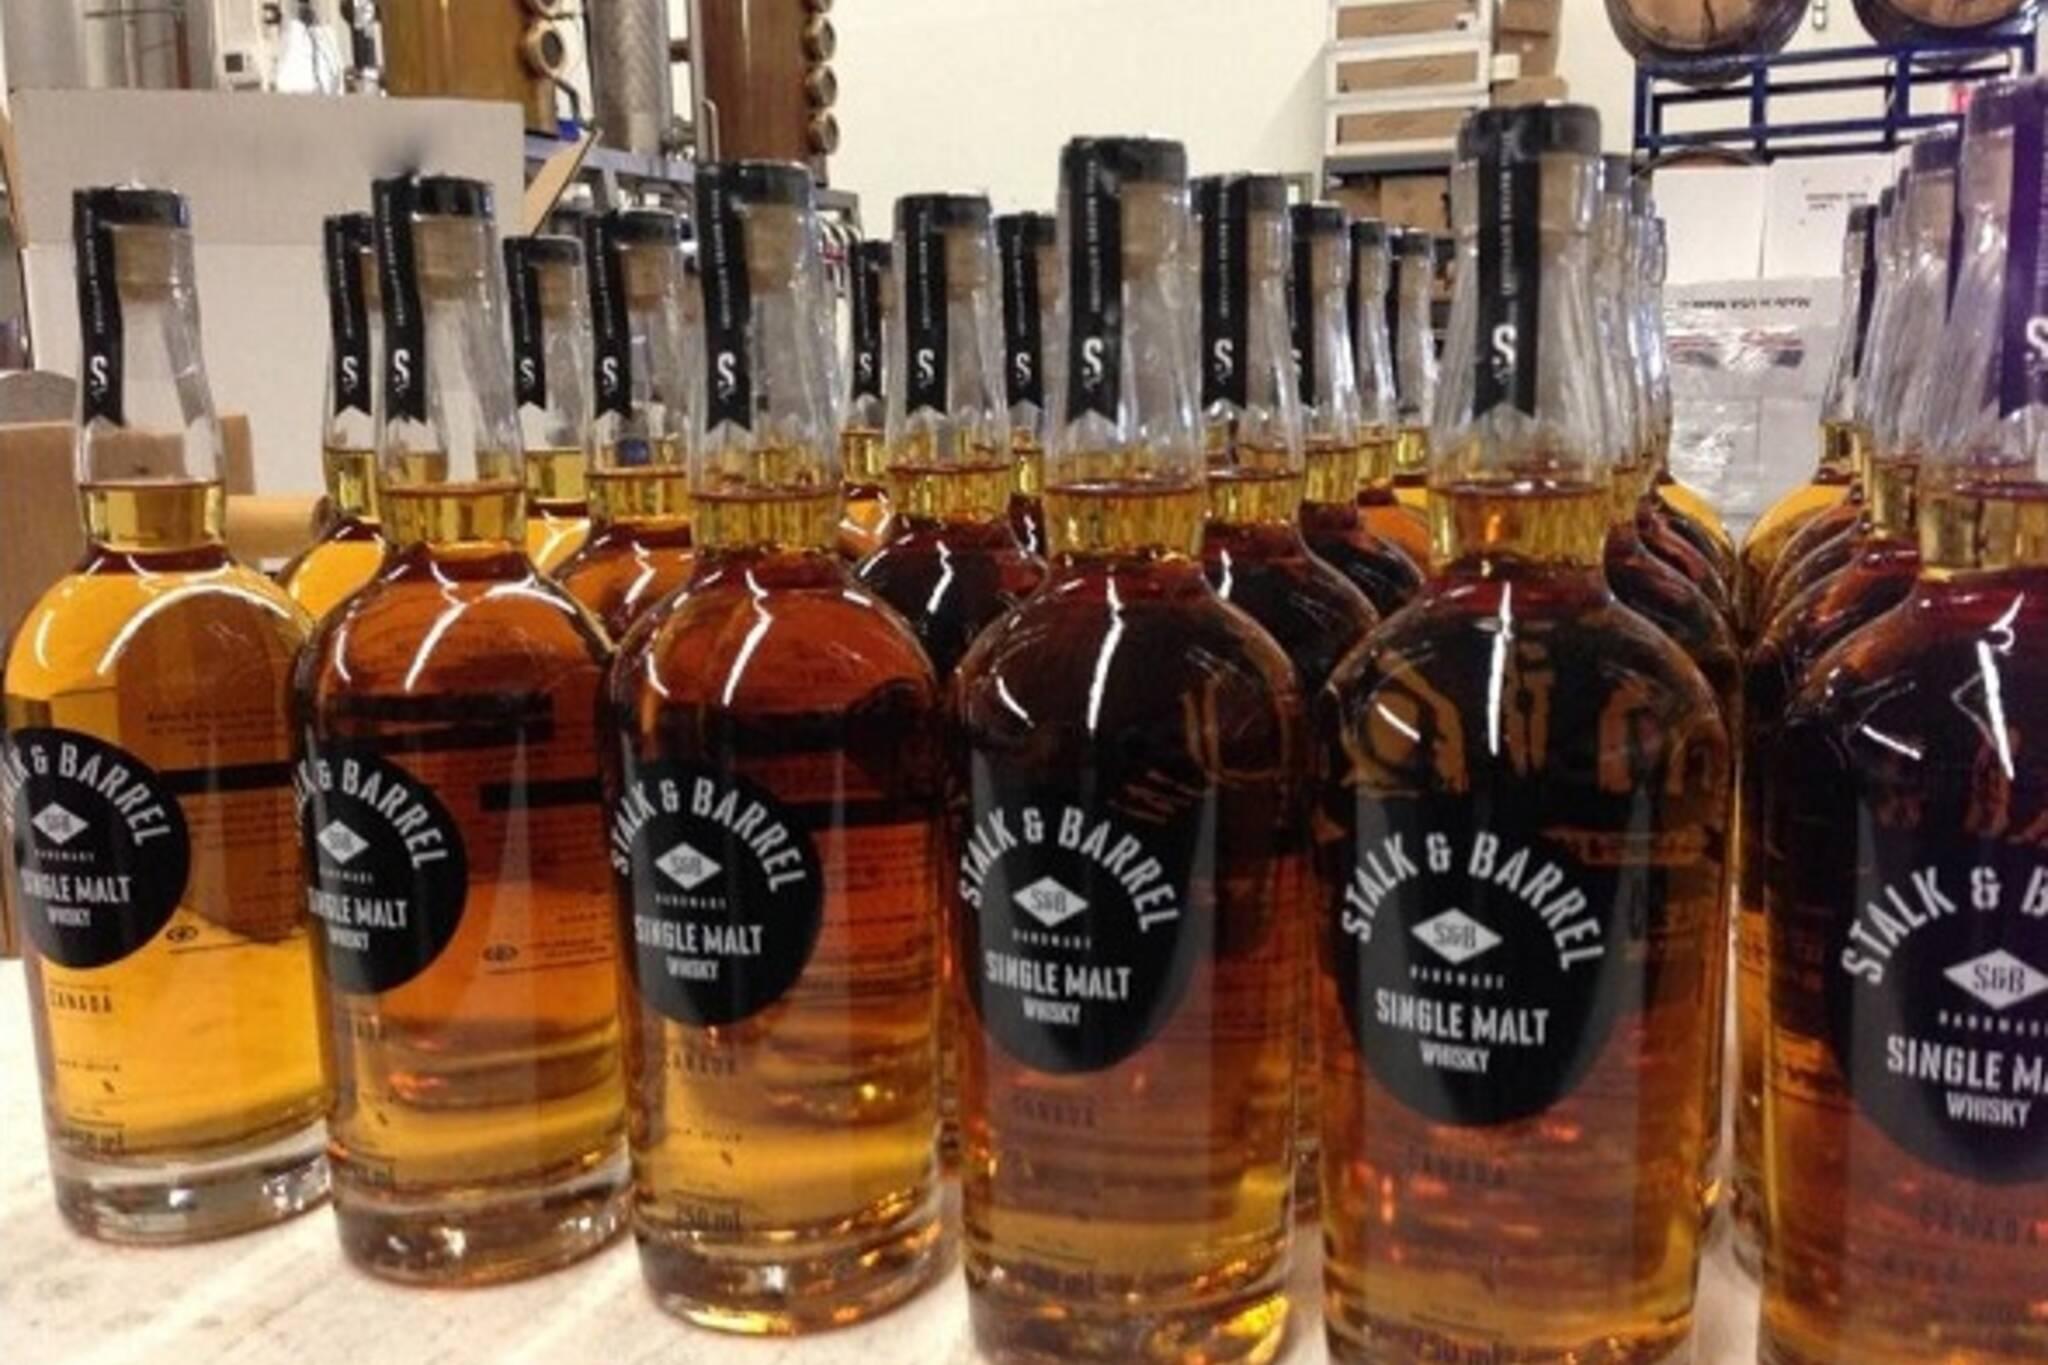 Still Waters micro-distillery